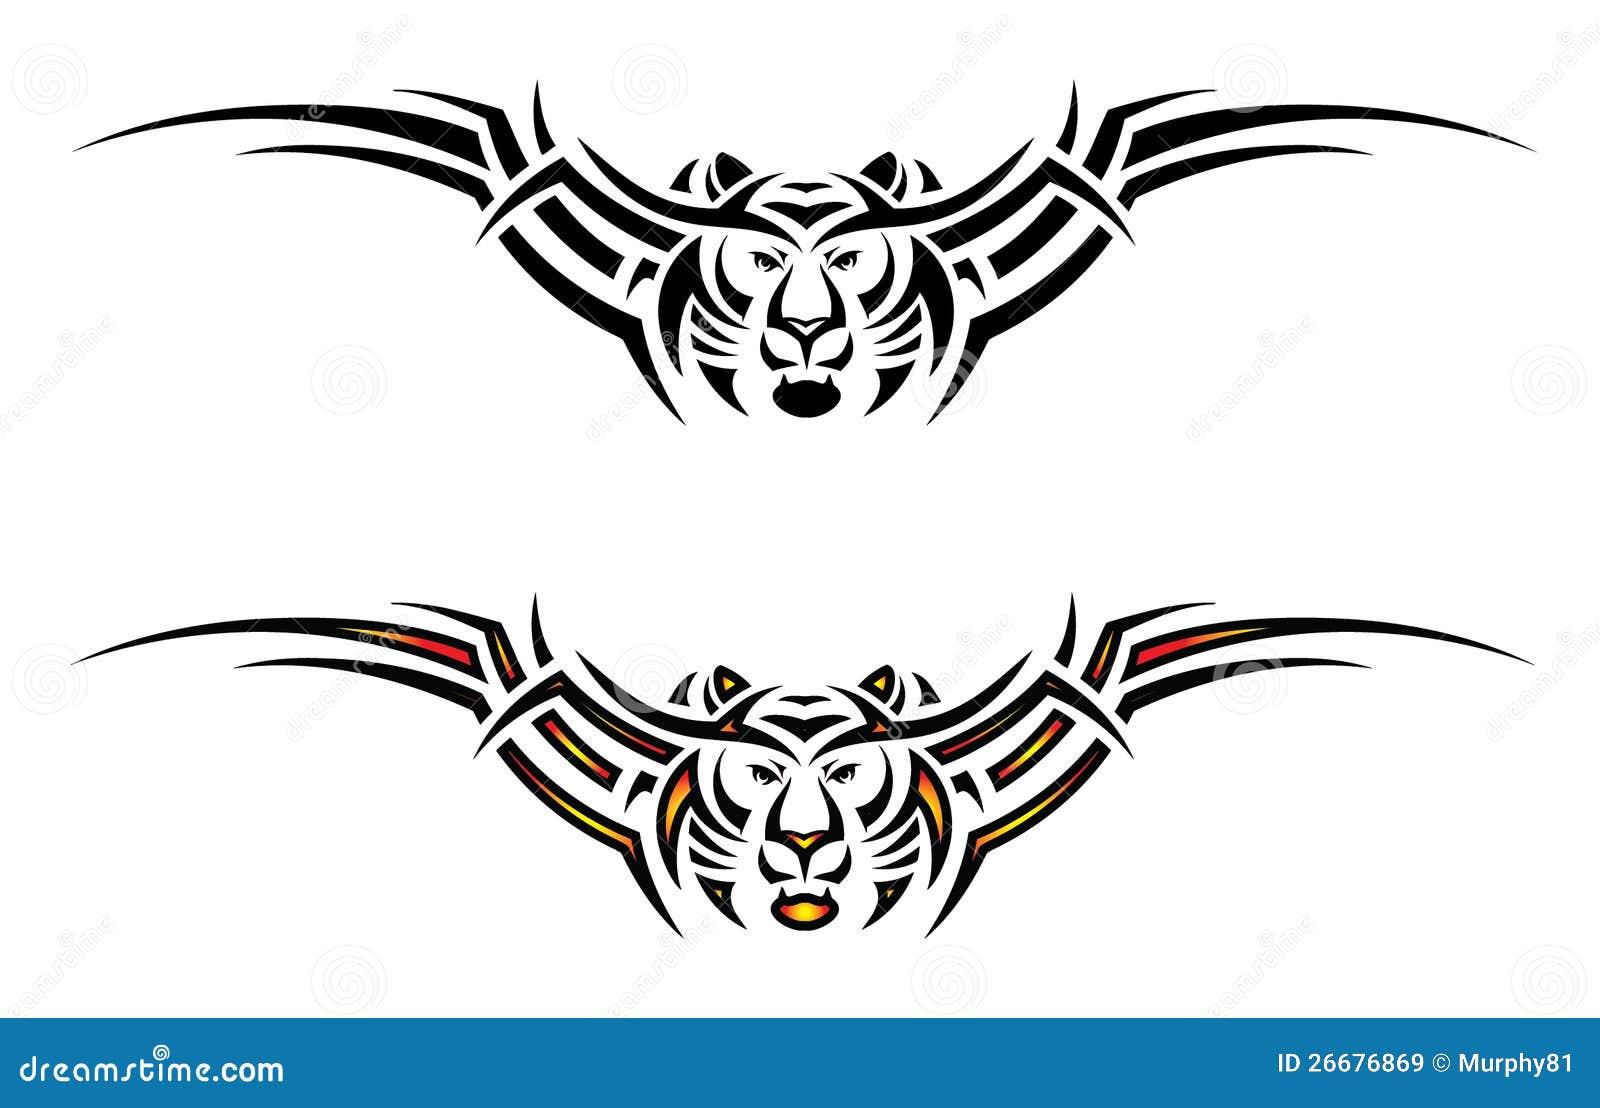 Tatuaje Tigre Tribal tatuaje tigre tribal